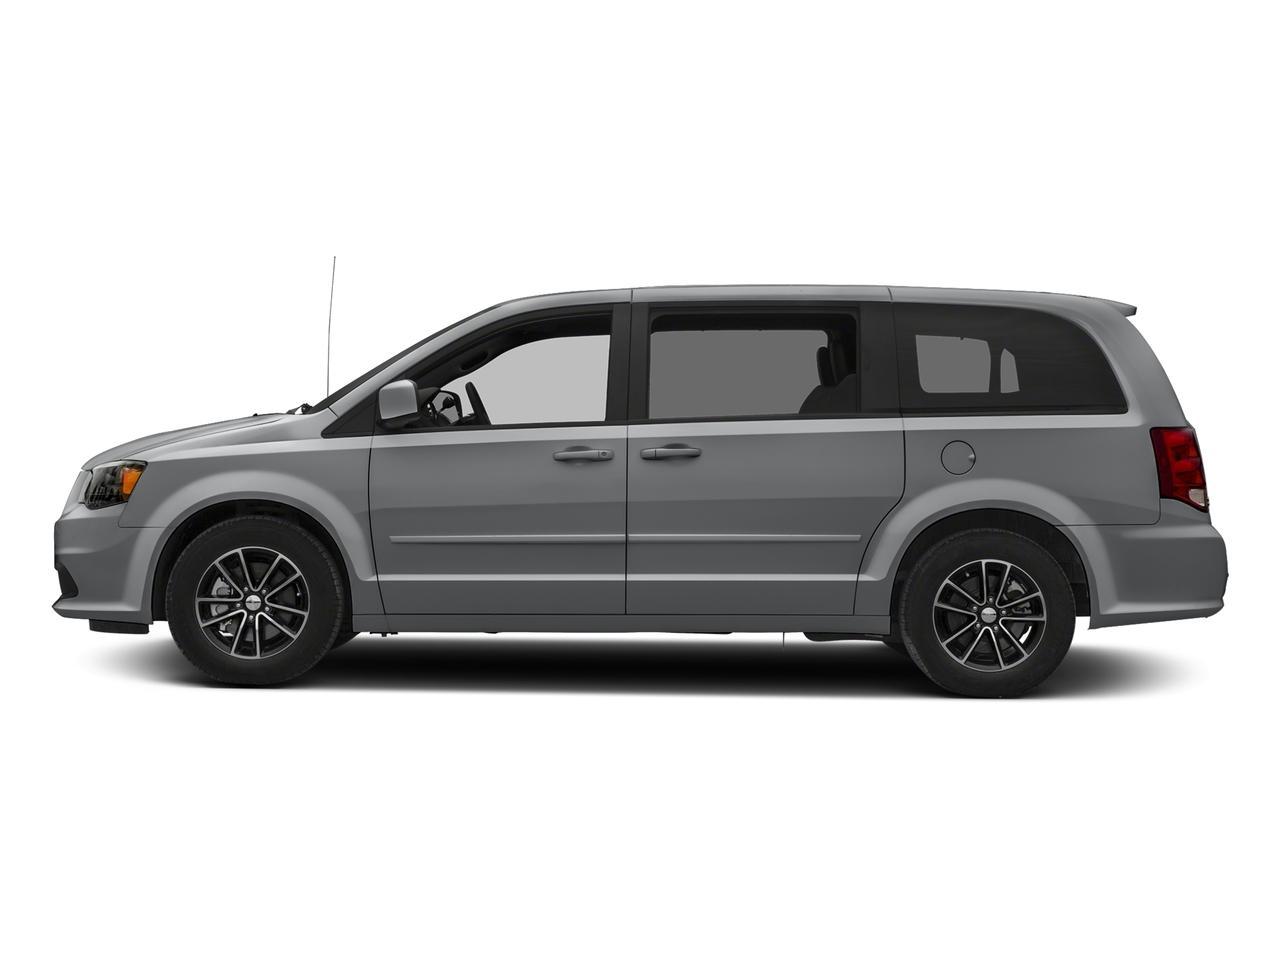 Used 2017 Dodge Grand Caravan GT with VIN 2C4RDGEG9HR545948 for sale in Willmar, Minnesota